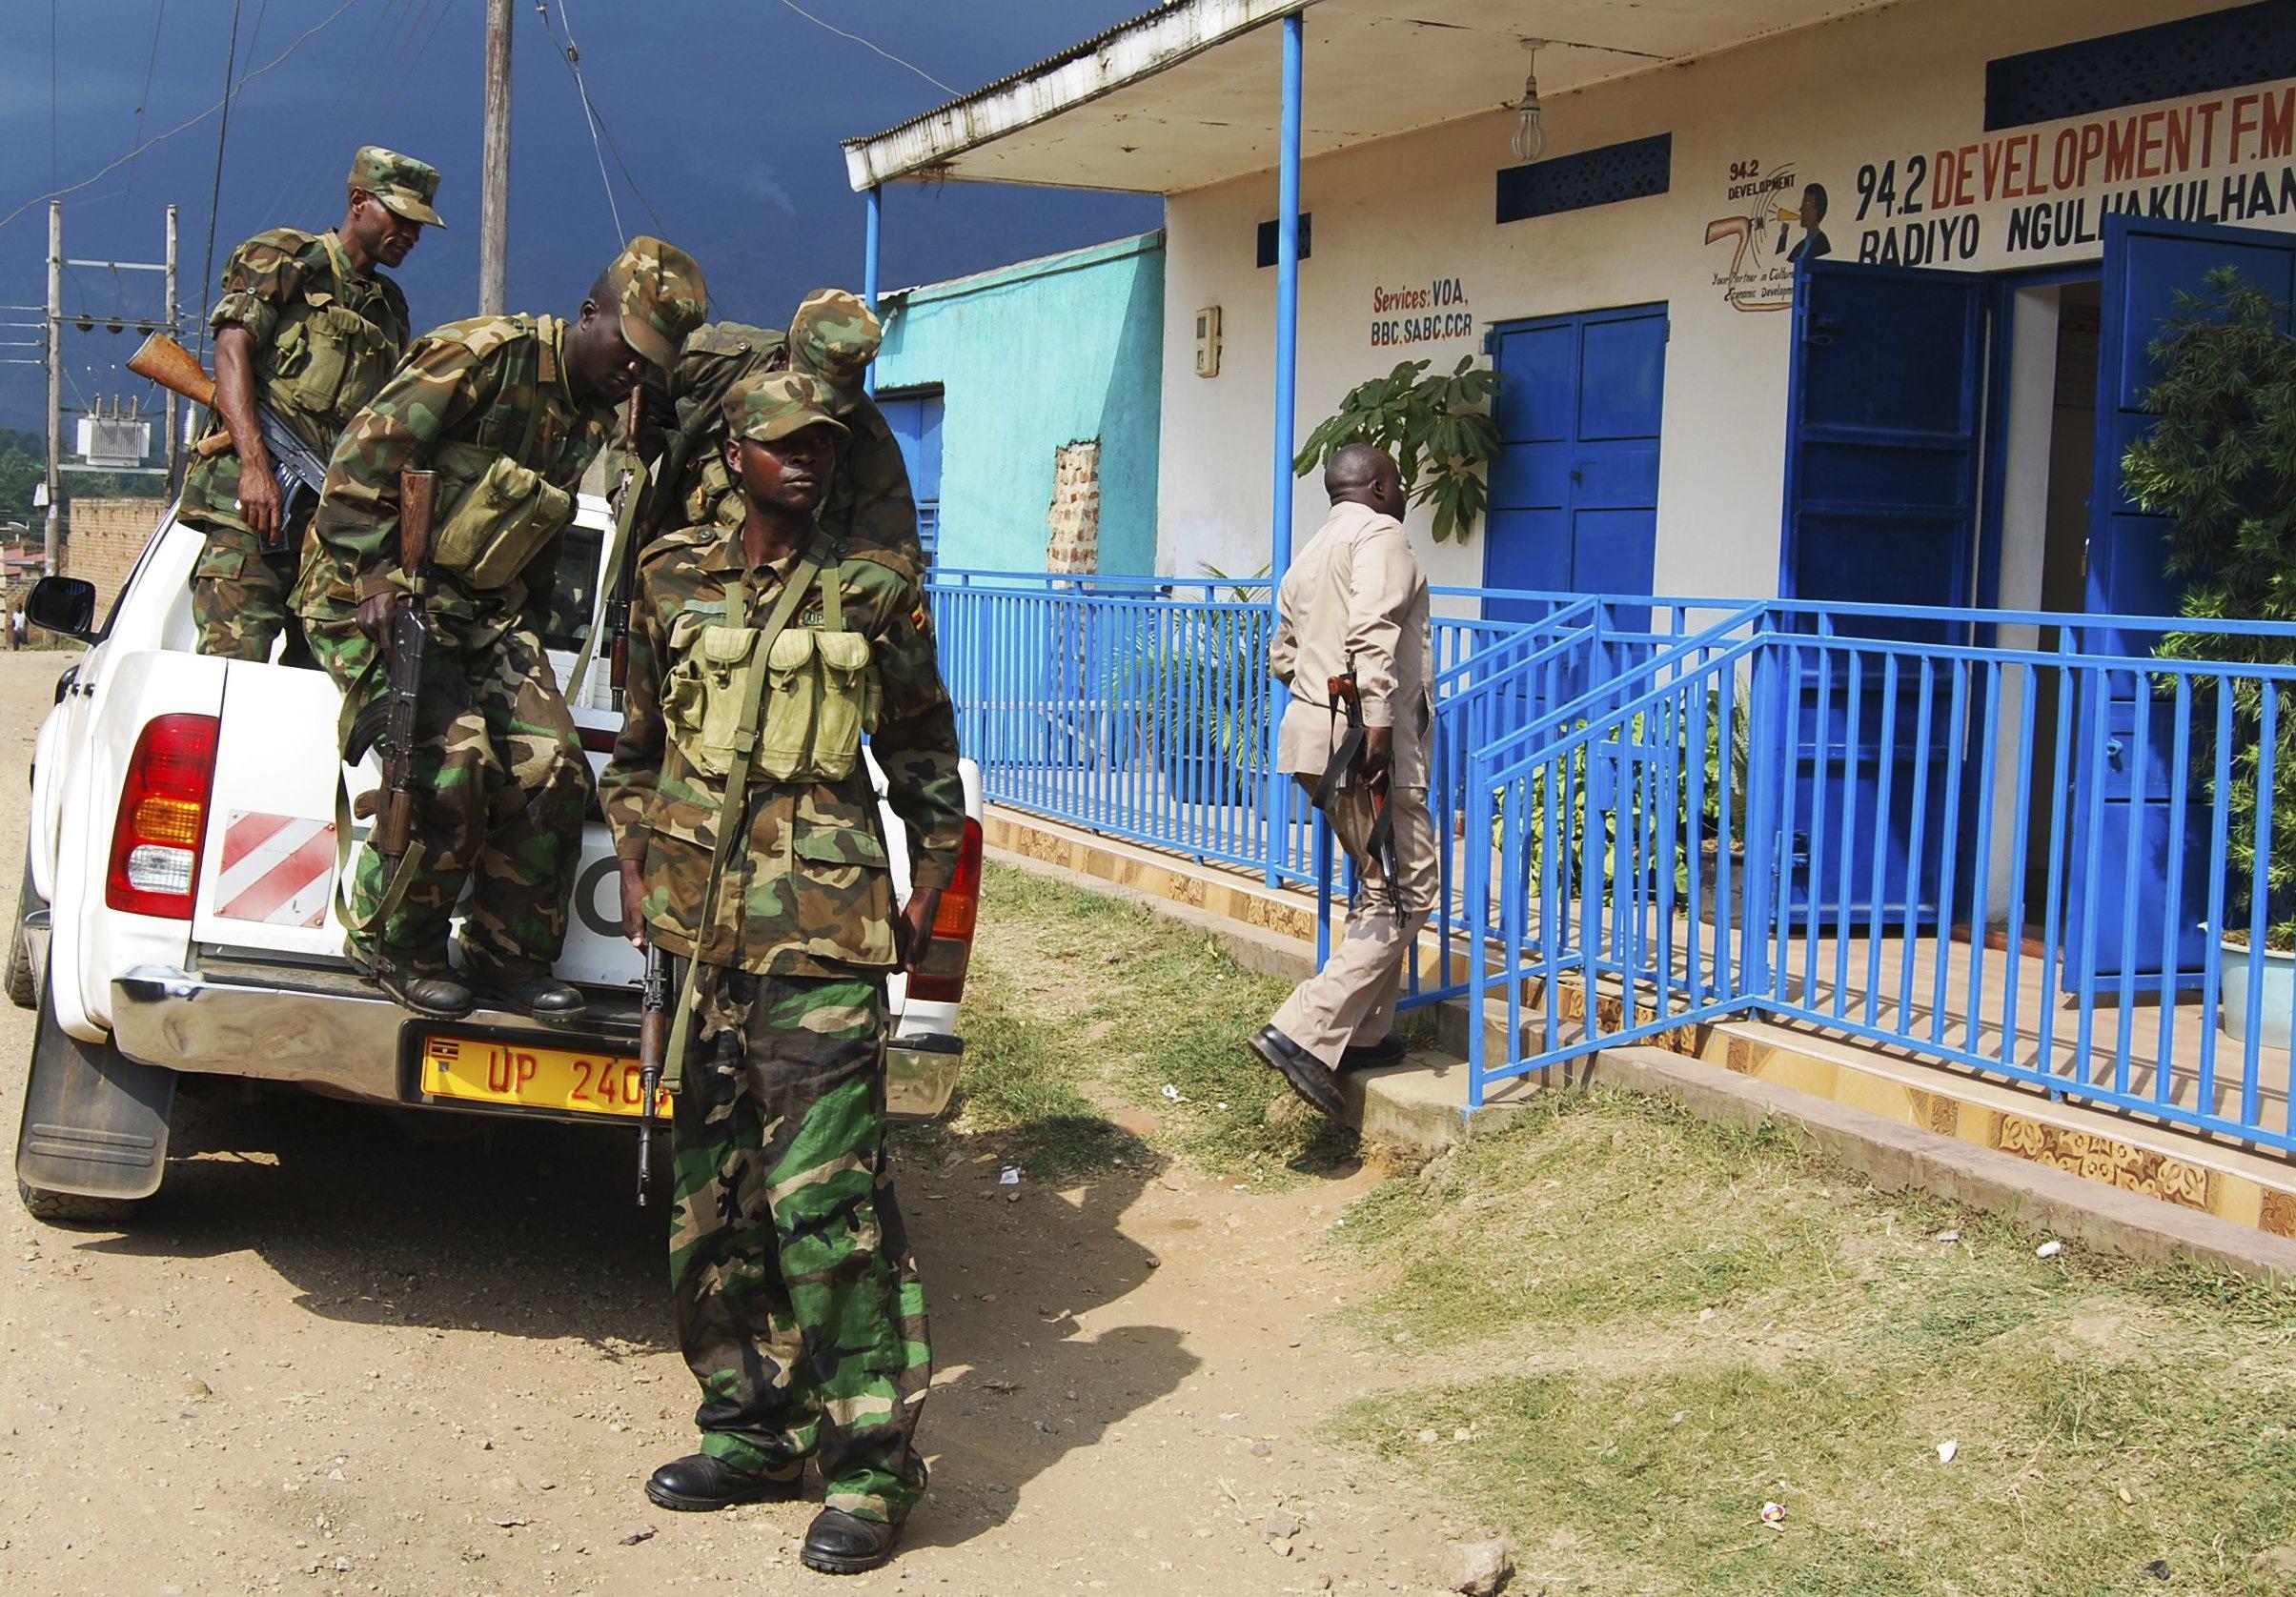 Uganda Says it Killed 60 Gunmen, Troops Deployed Near Oil Area